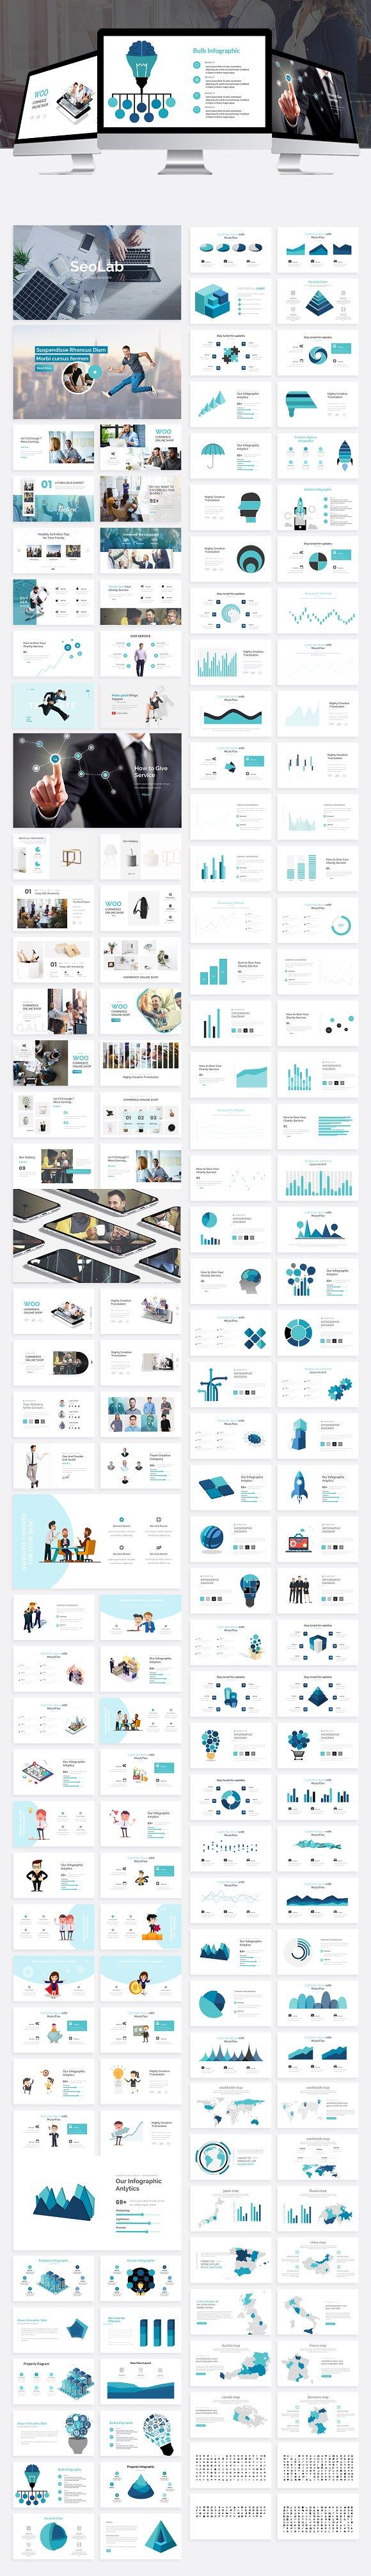 SeoLab Business Agency Google Slide